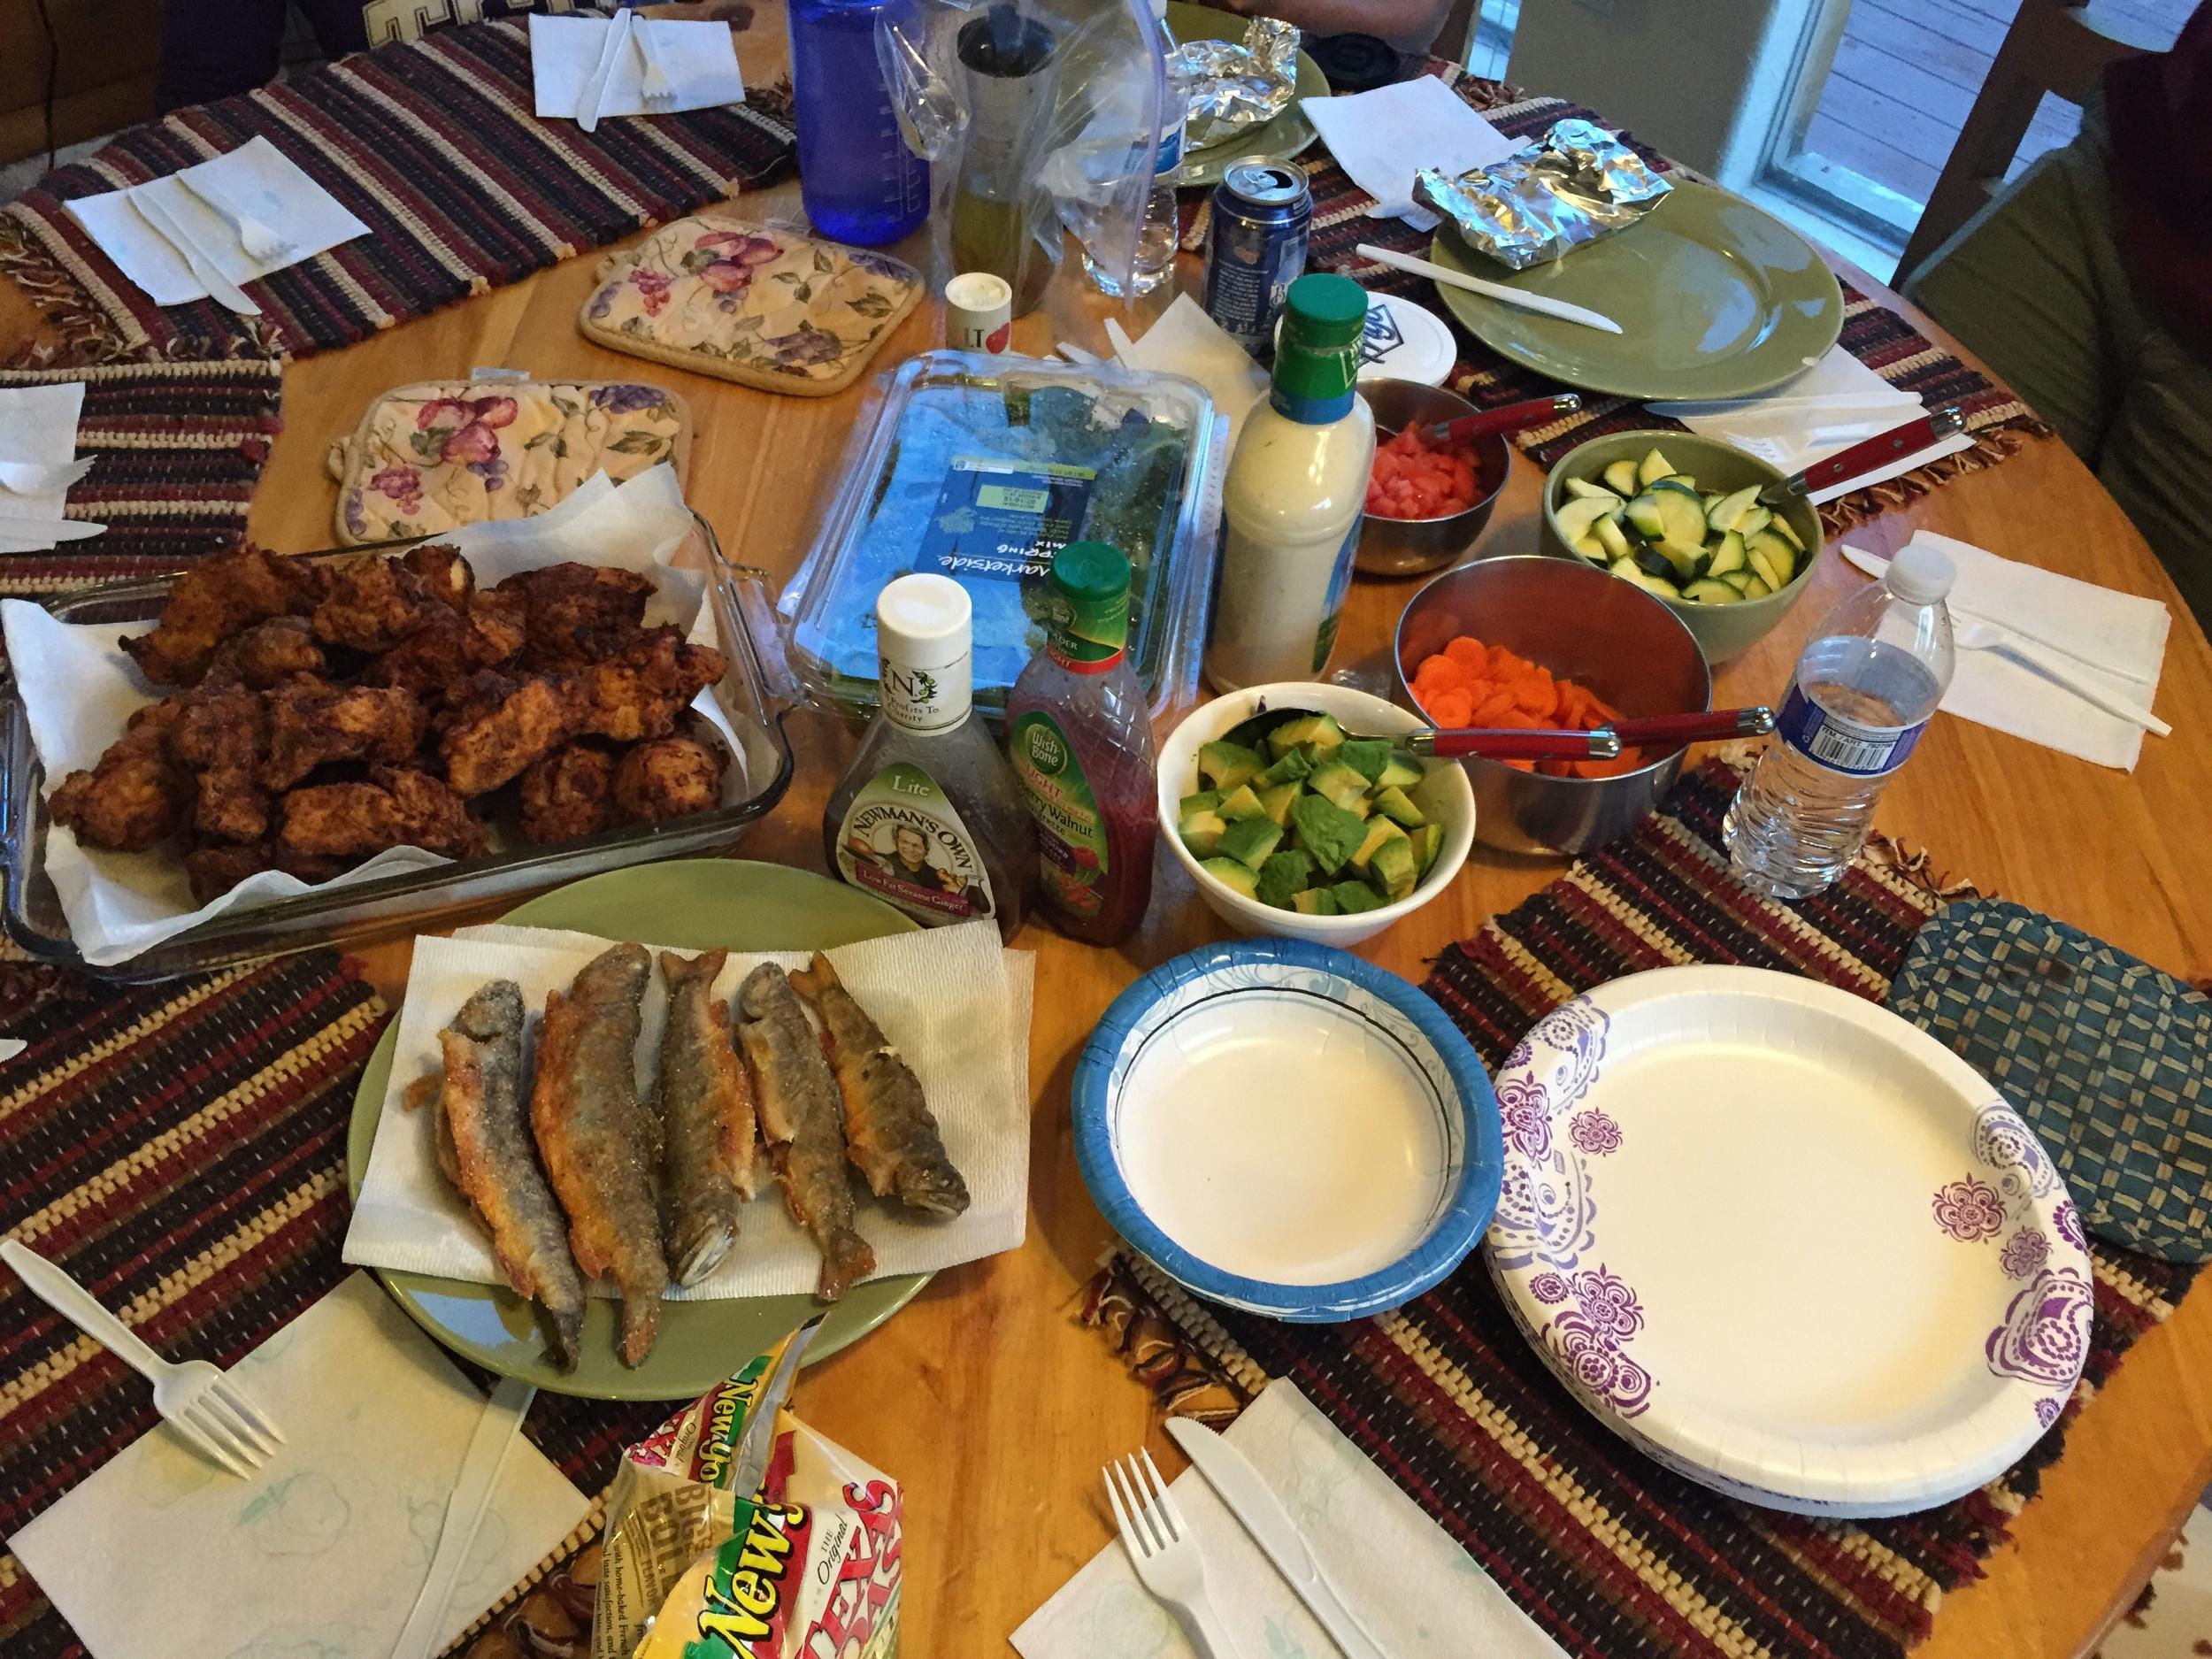 Saturday Dinner